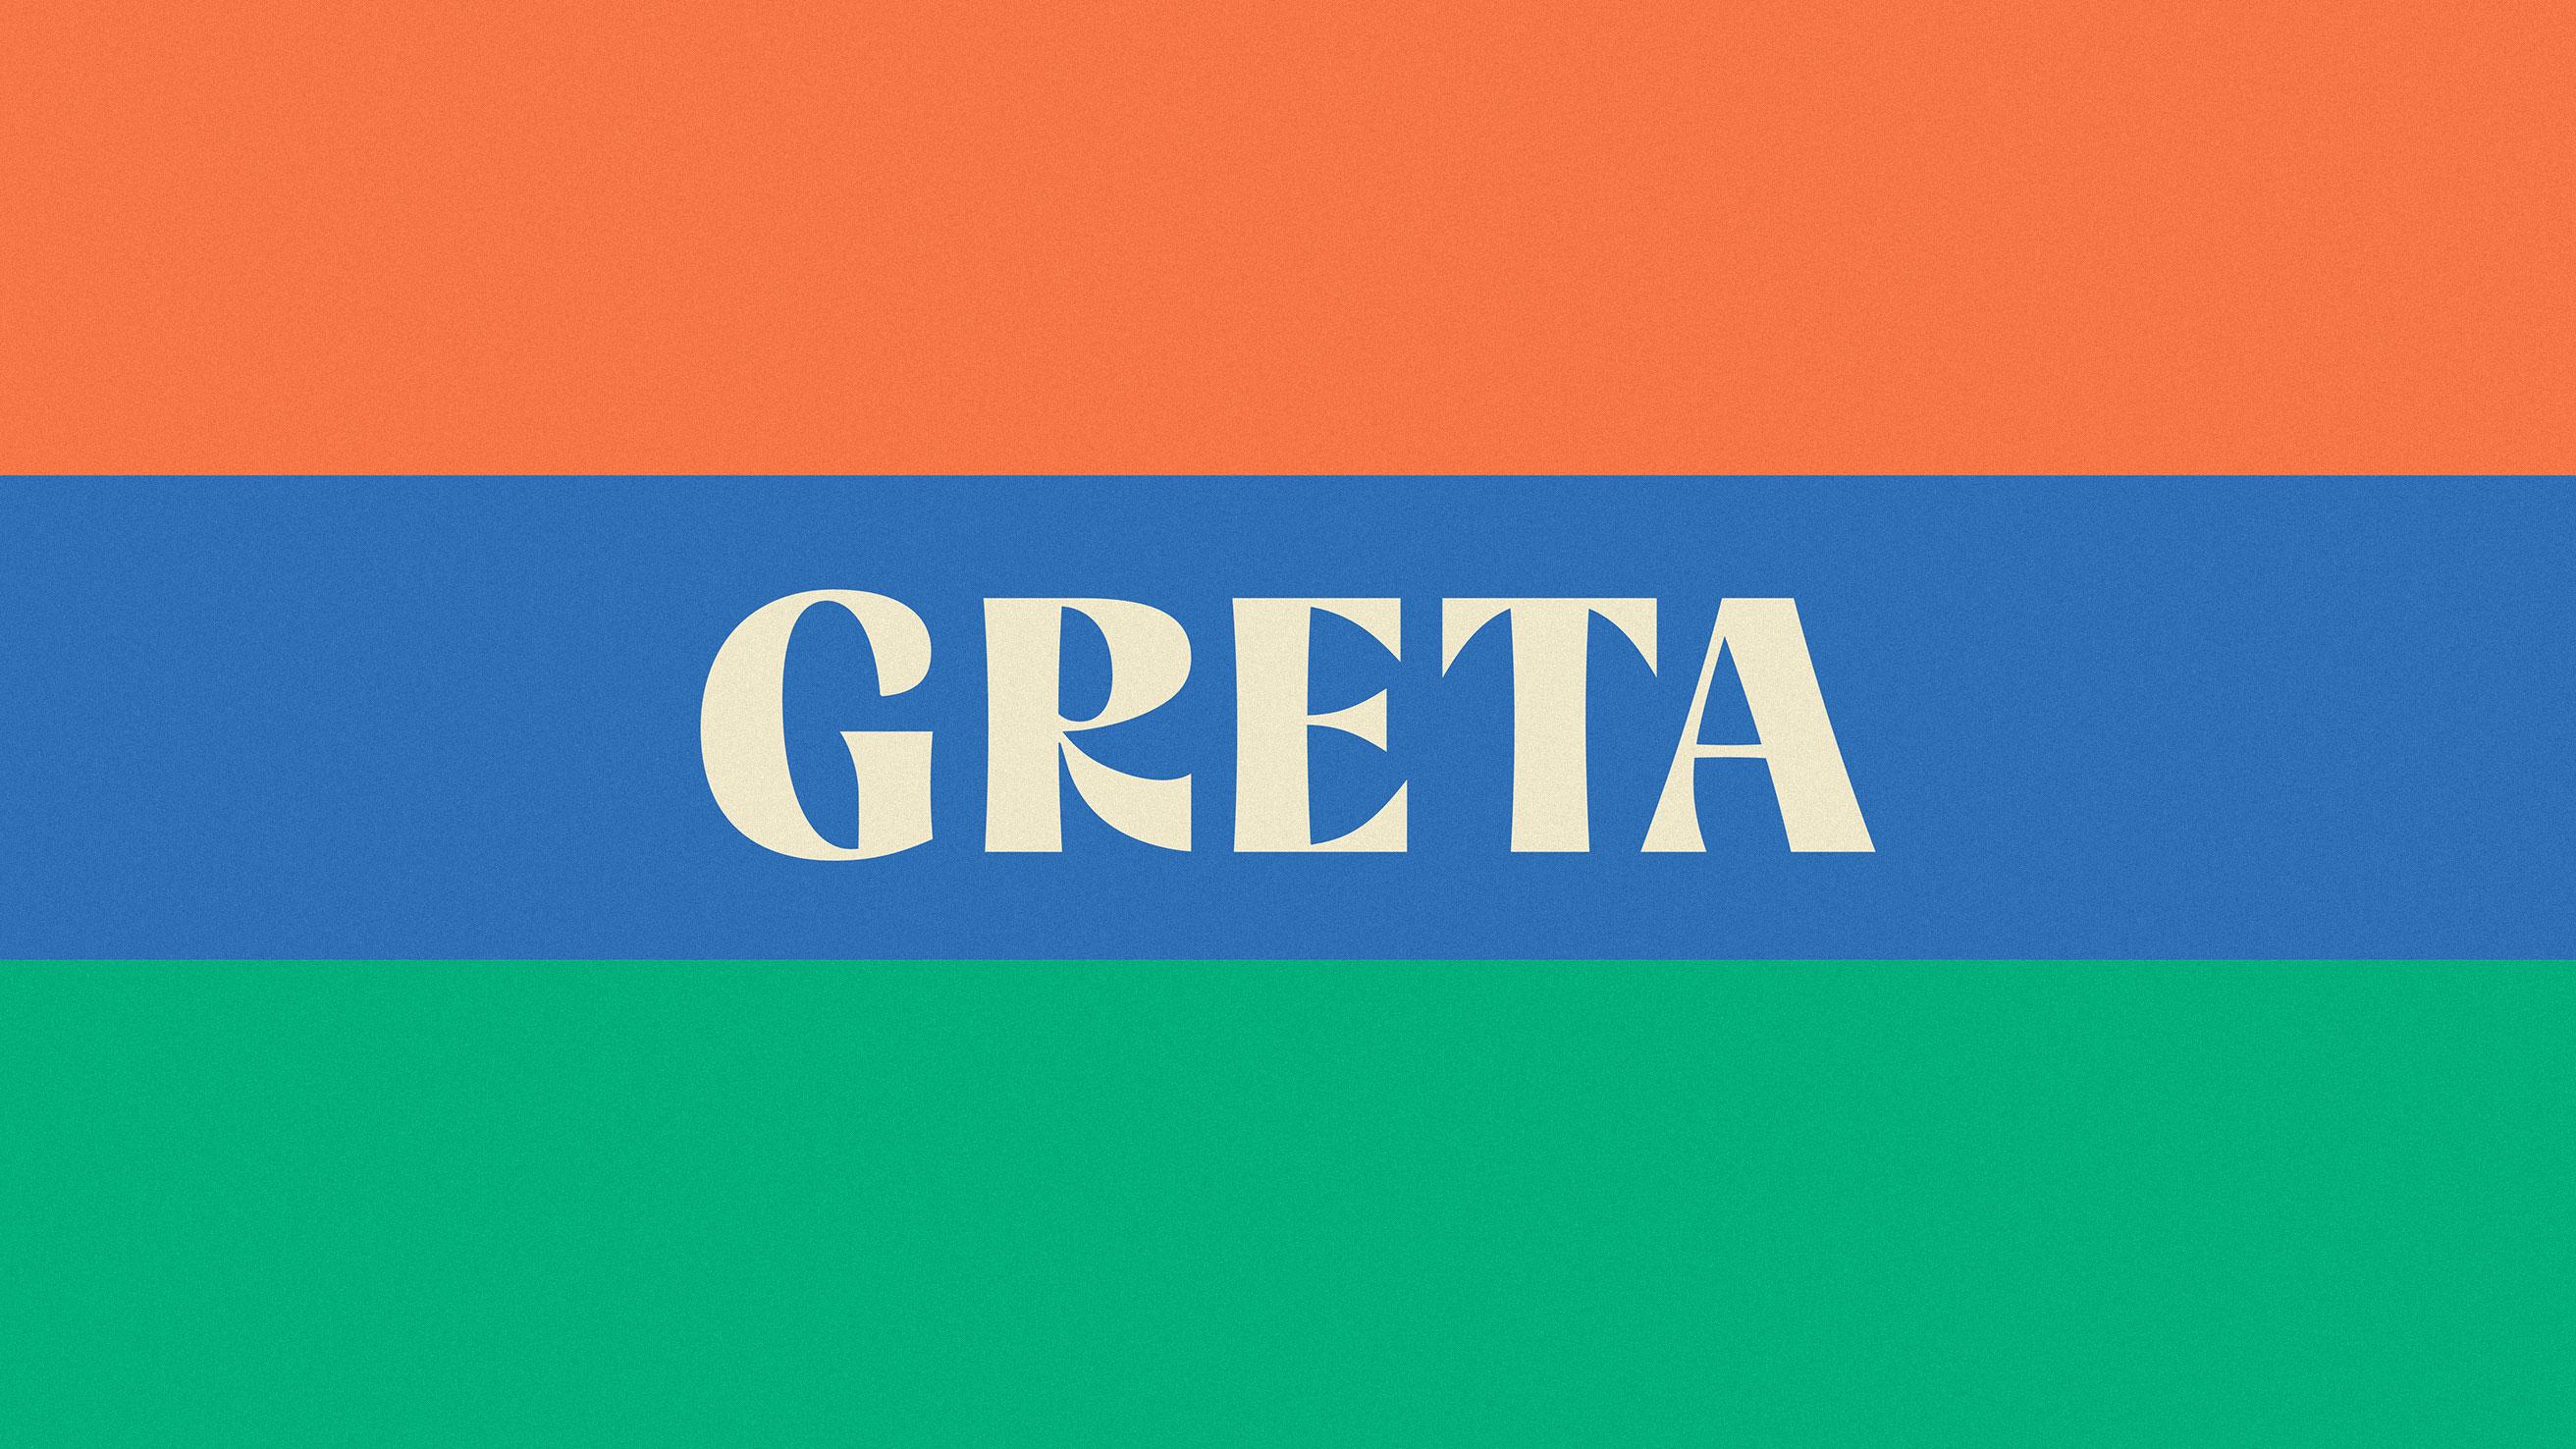 MGS_Greta_001